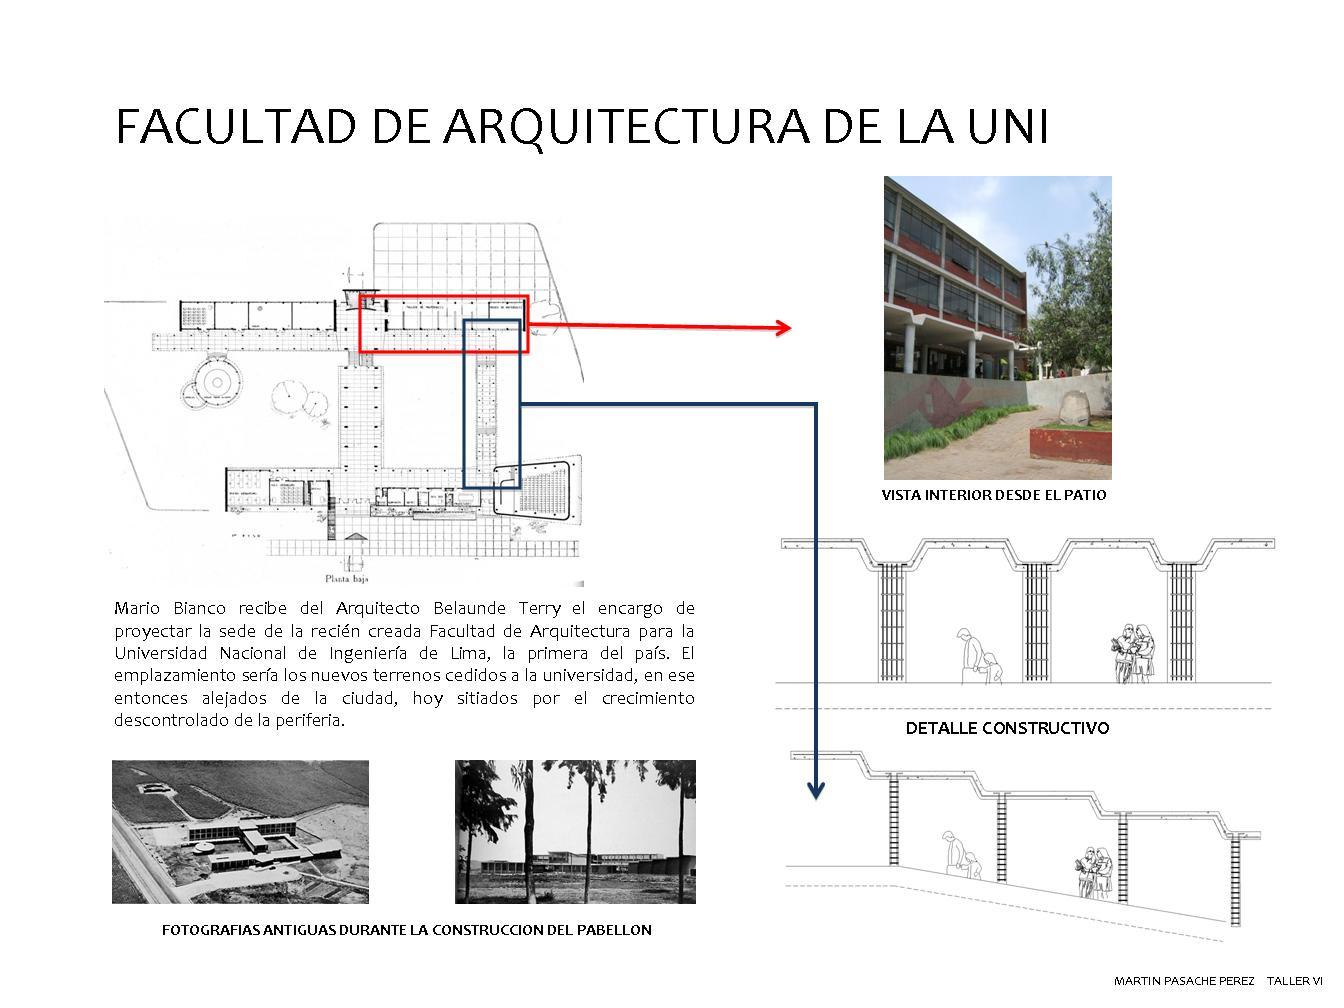 Panel de la facultad de arquitectura de la uni puruchuquing for Facultad de arquitectura